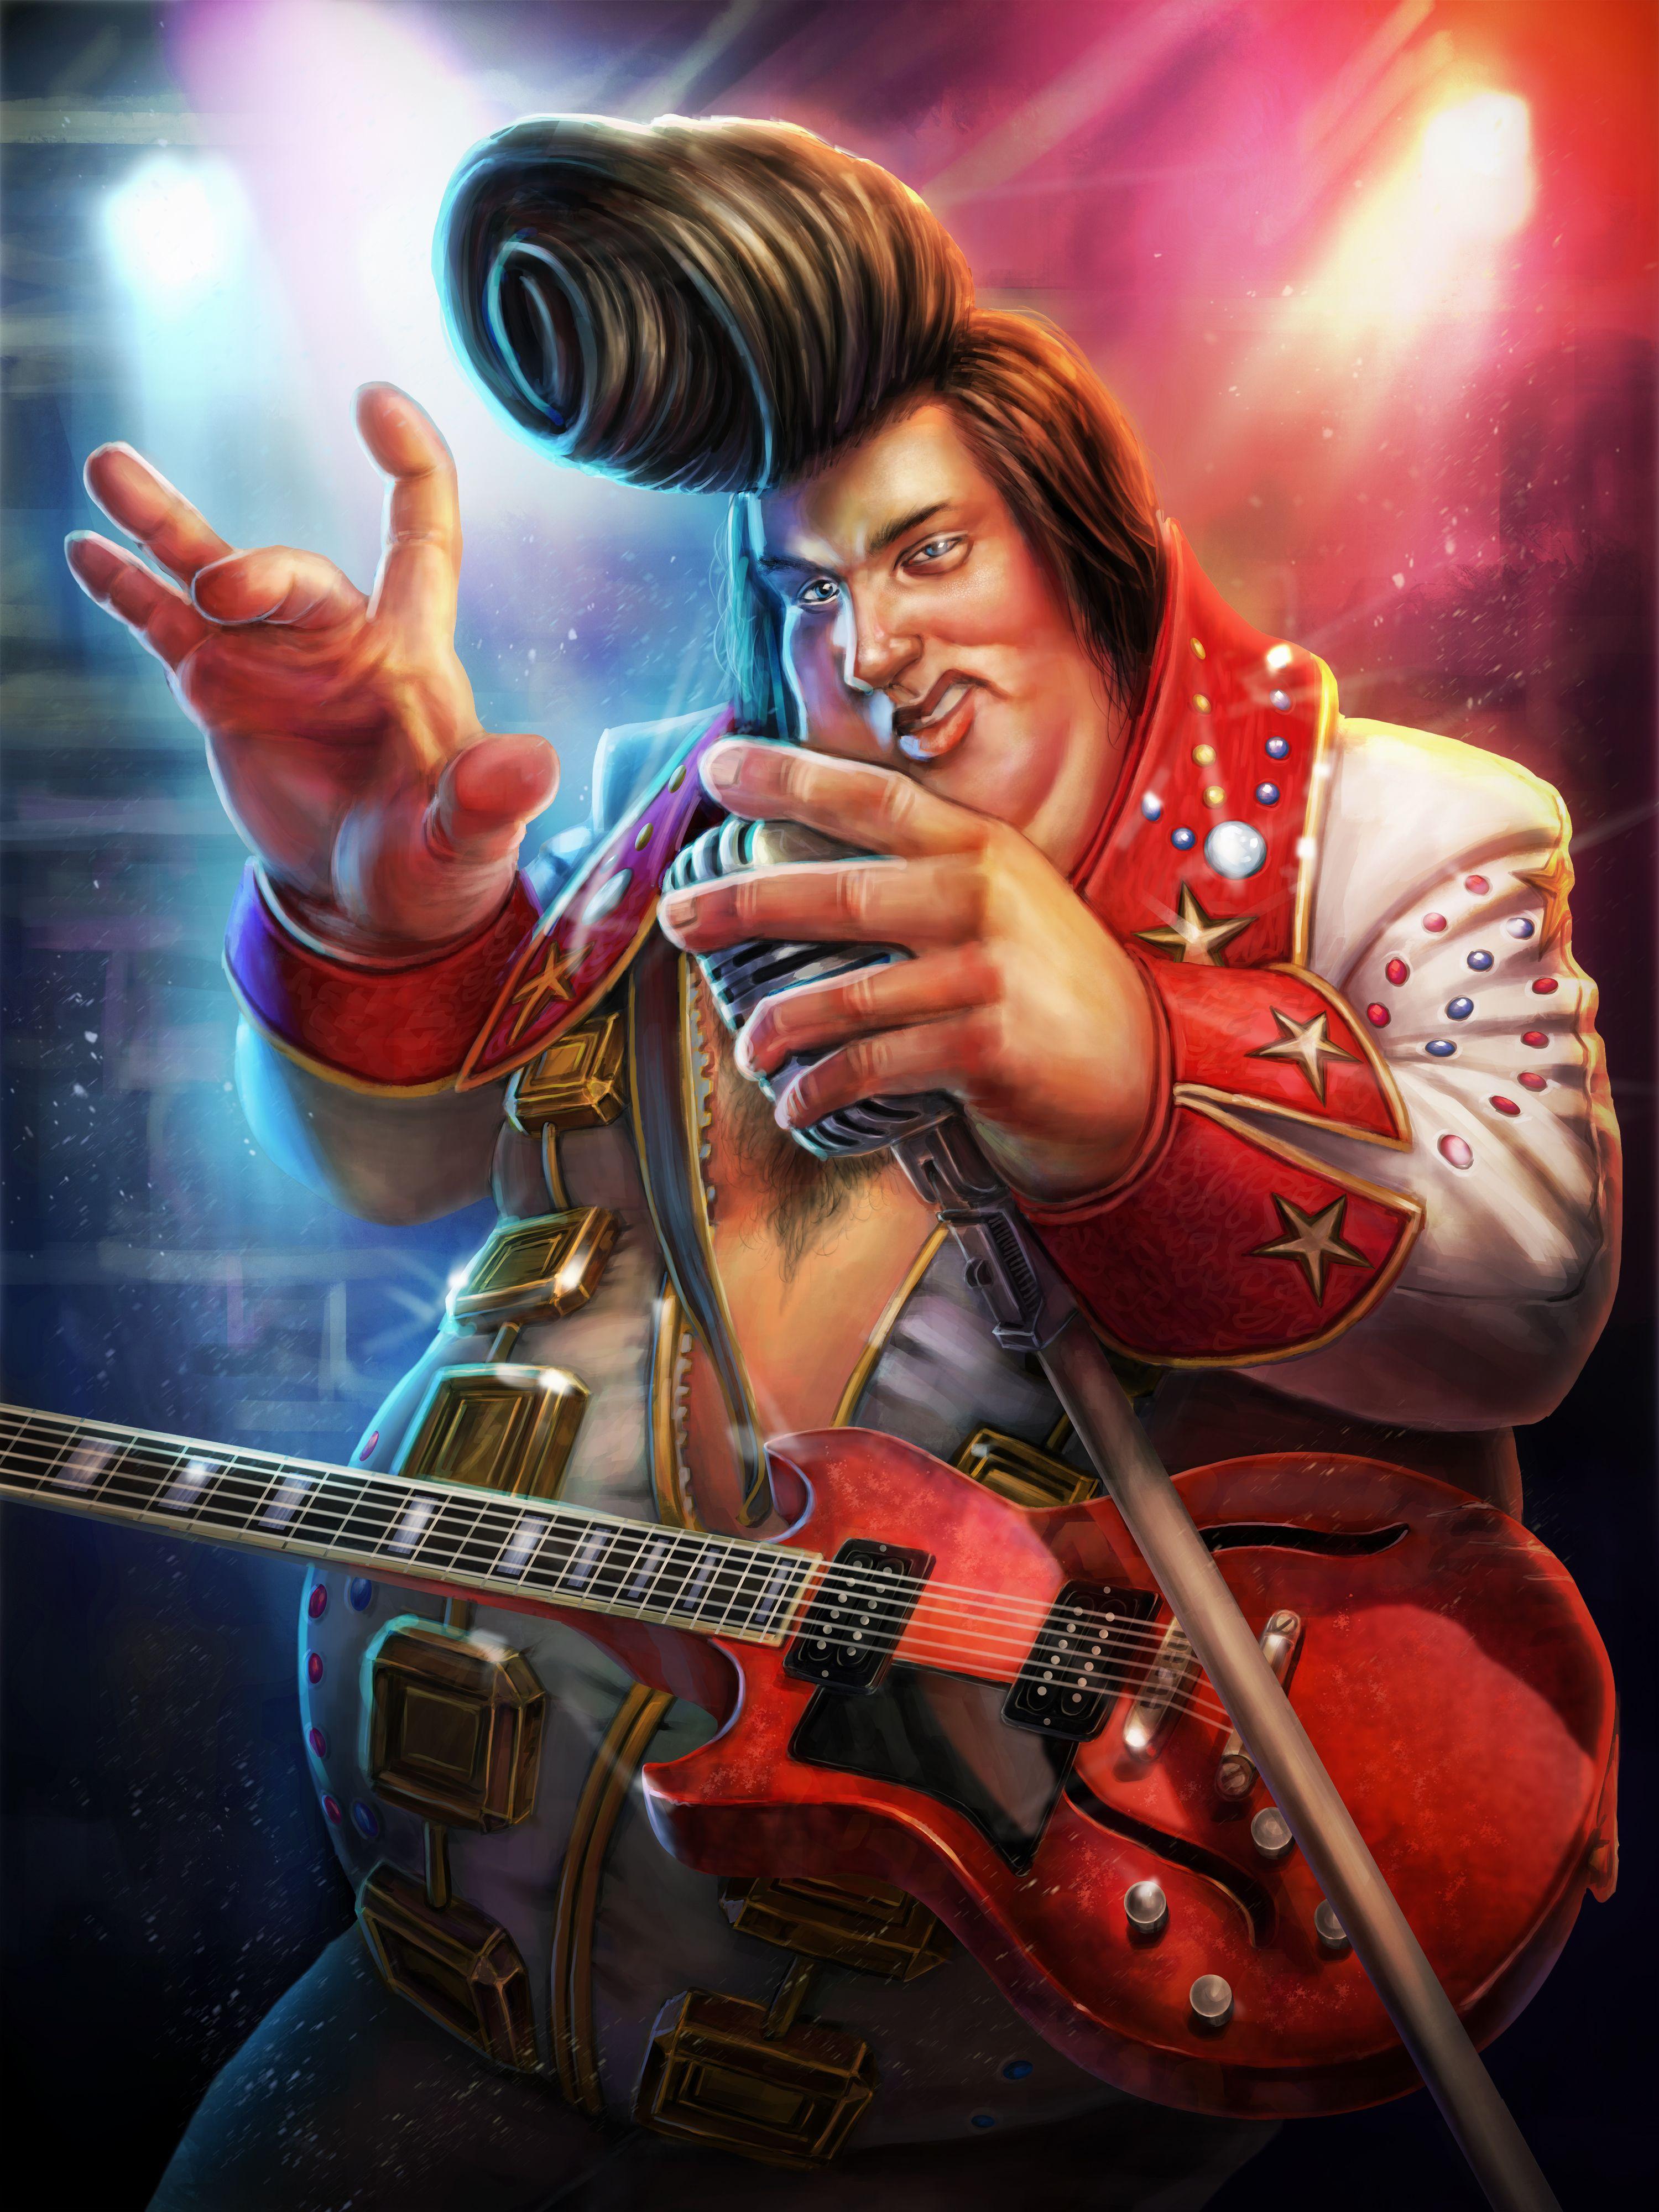 Baco El Rey Bacchus Music Art Art